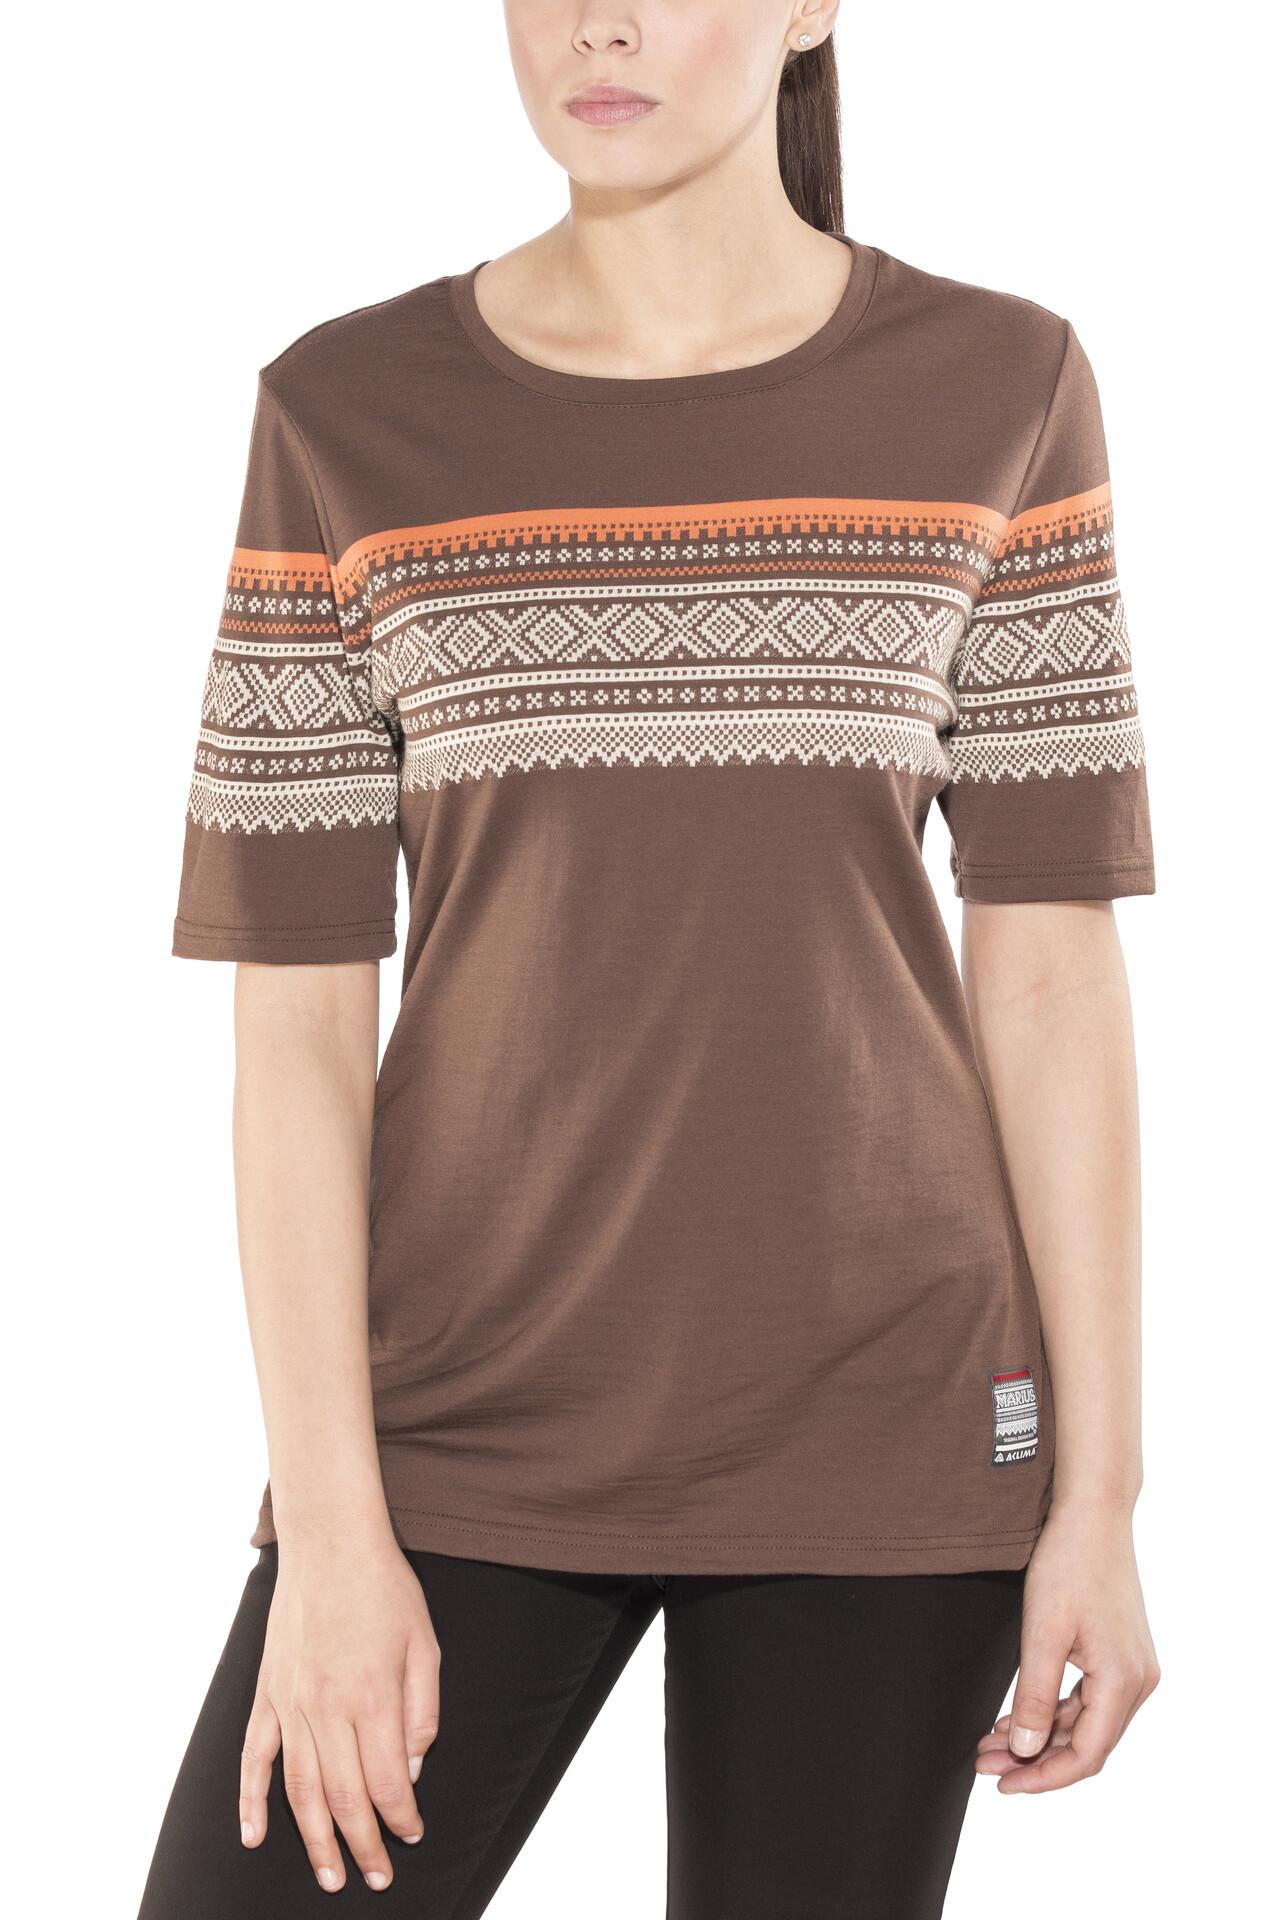 Aclima DesignWool Marius Merino T Shirt Damen fondue fudge